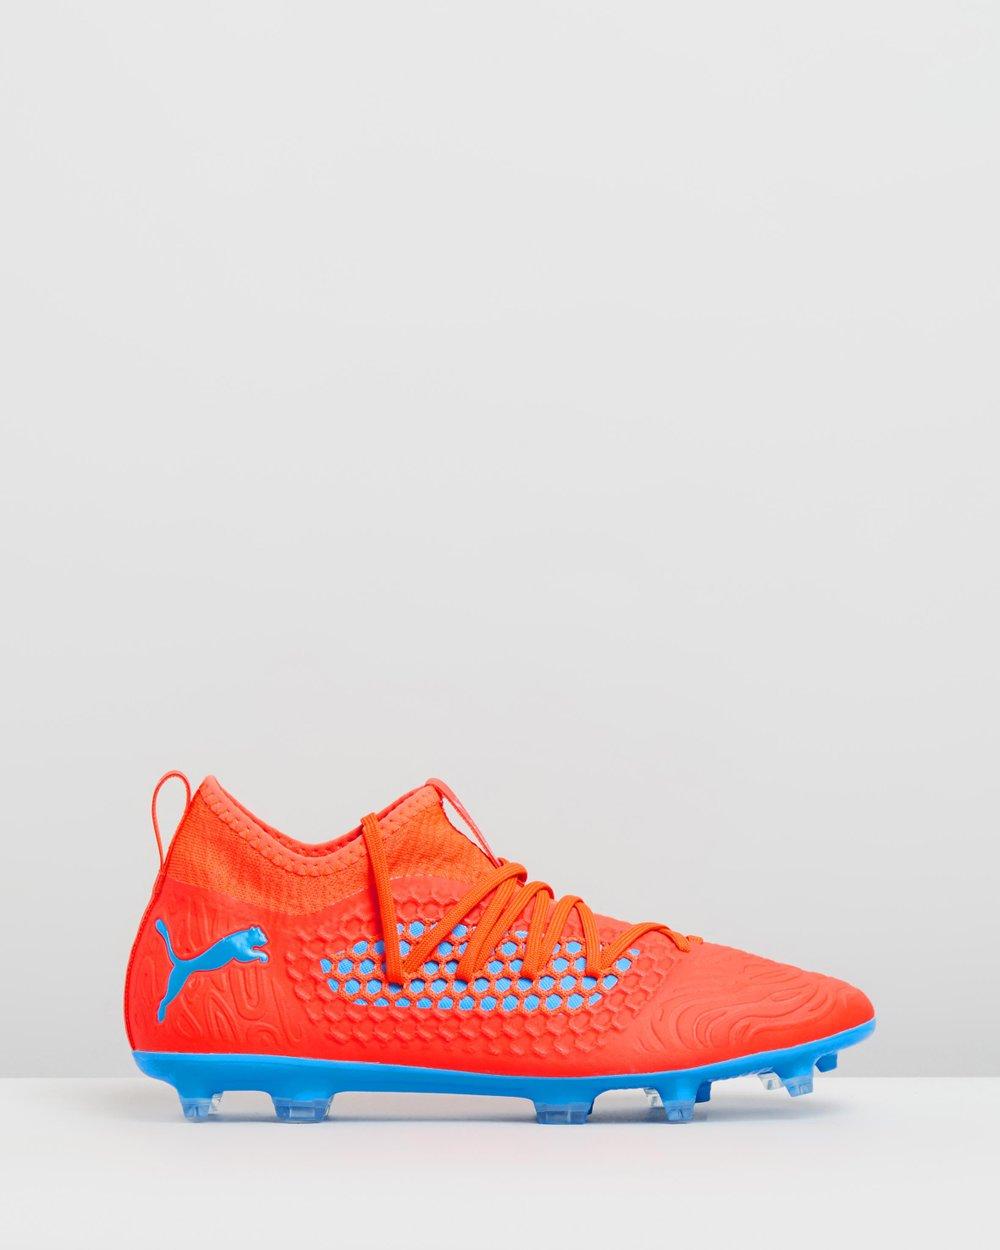 f99a3e5f6f48 Future 19.3 Netfit FG/AG Football Boots - Men's by Puma Online | THE ICONIC  | Australia